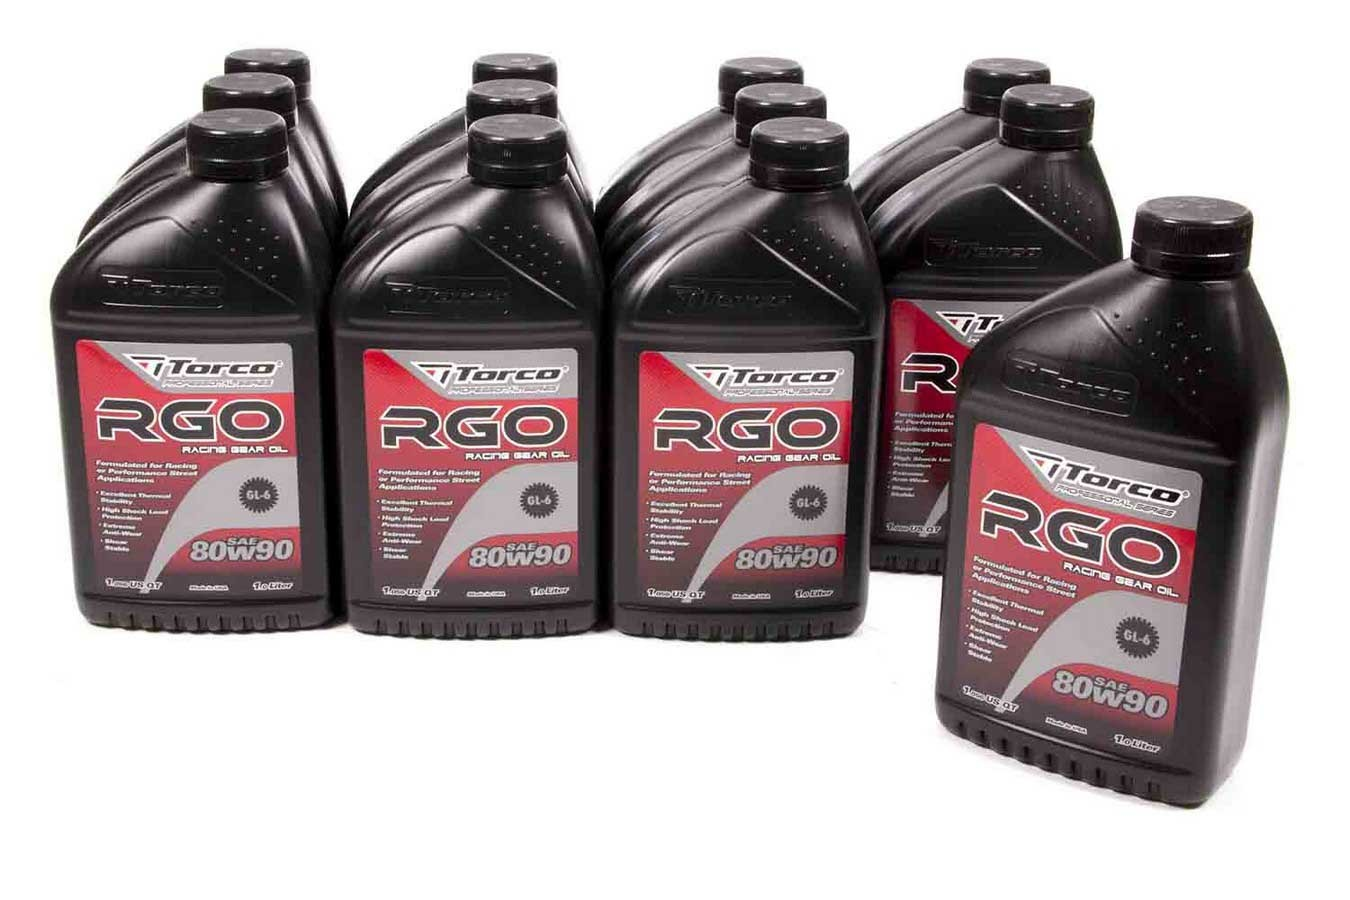 Torco RGO 80w90 Racing Gear Oil Case/12-1 Liter